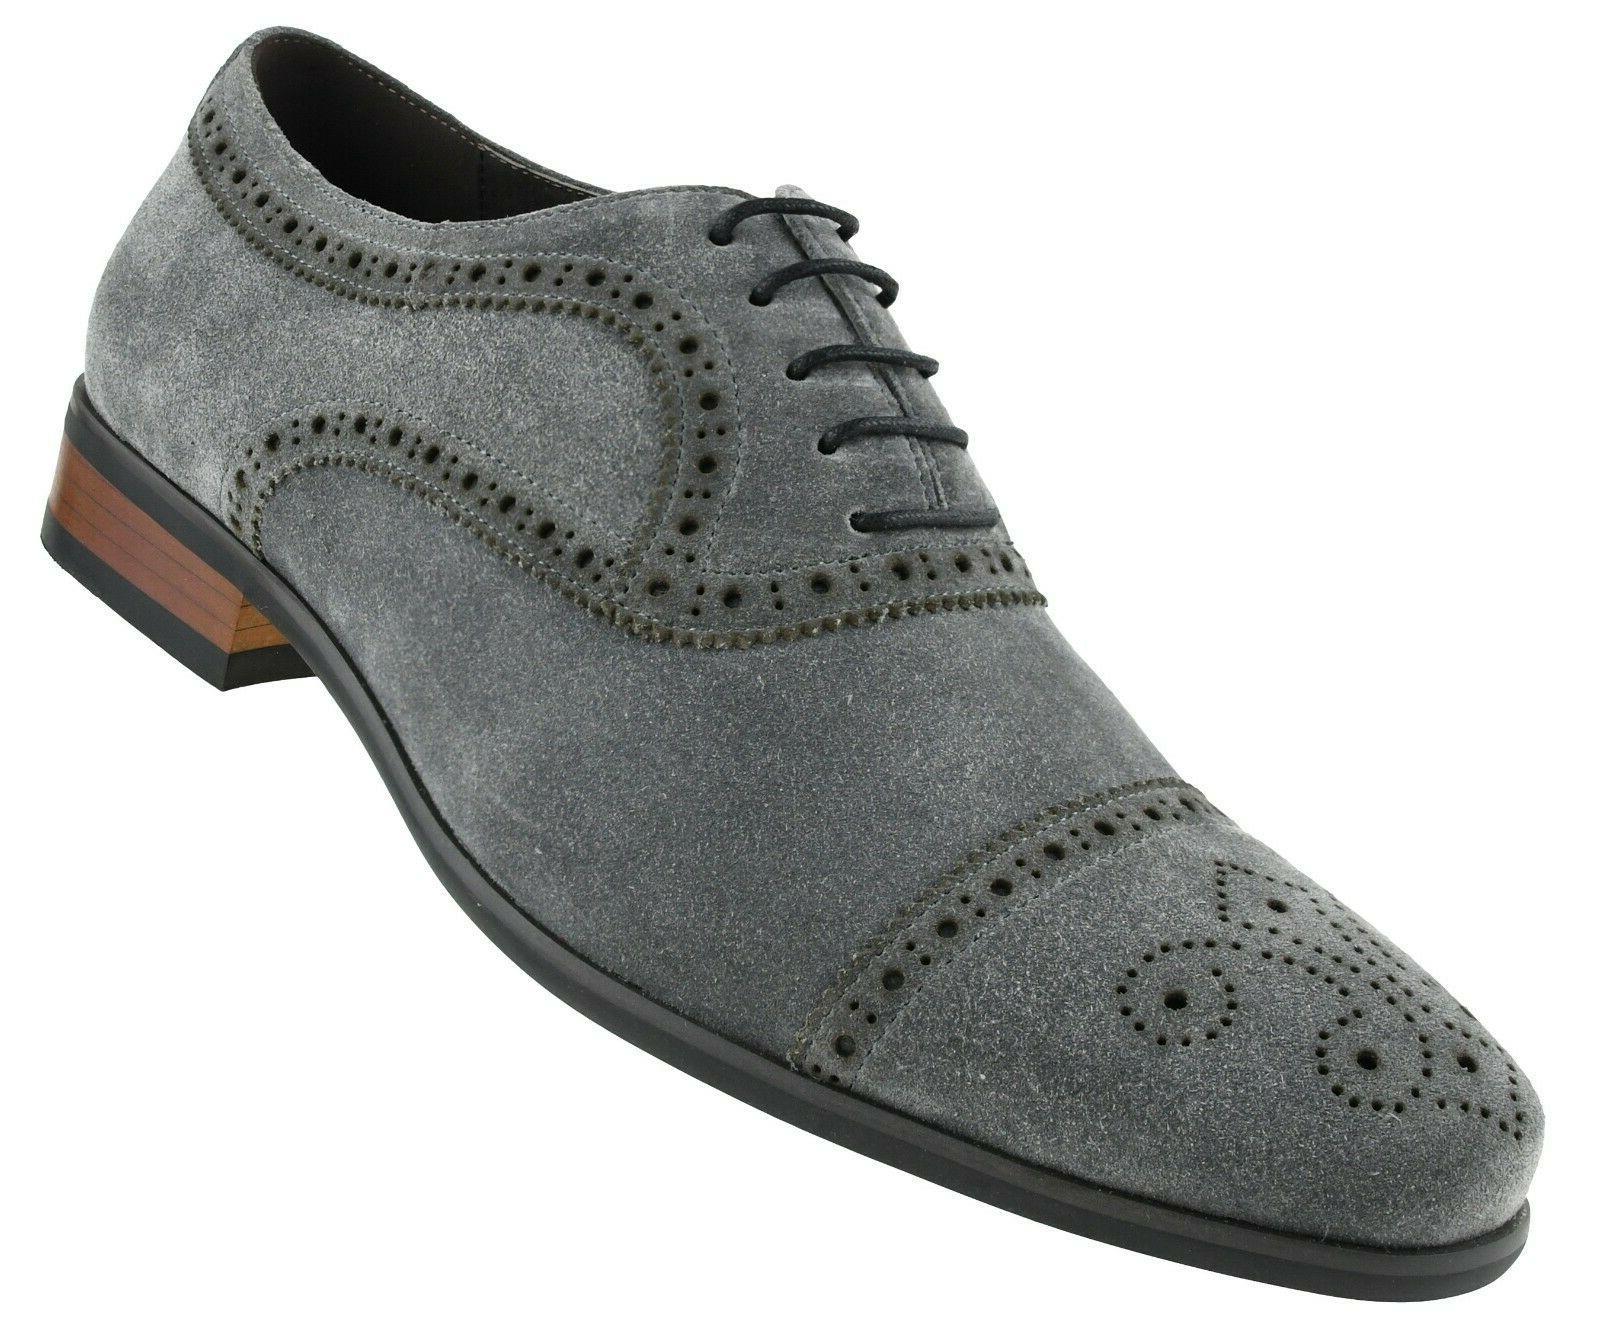 Men's Cow Suede Dress Shoe